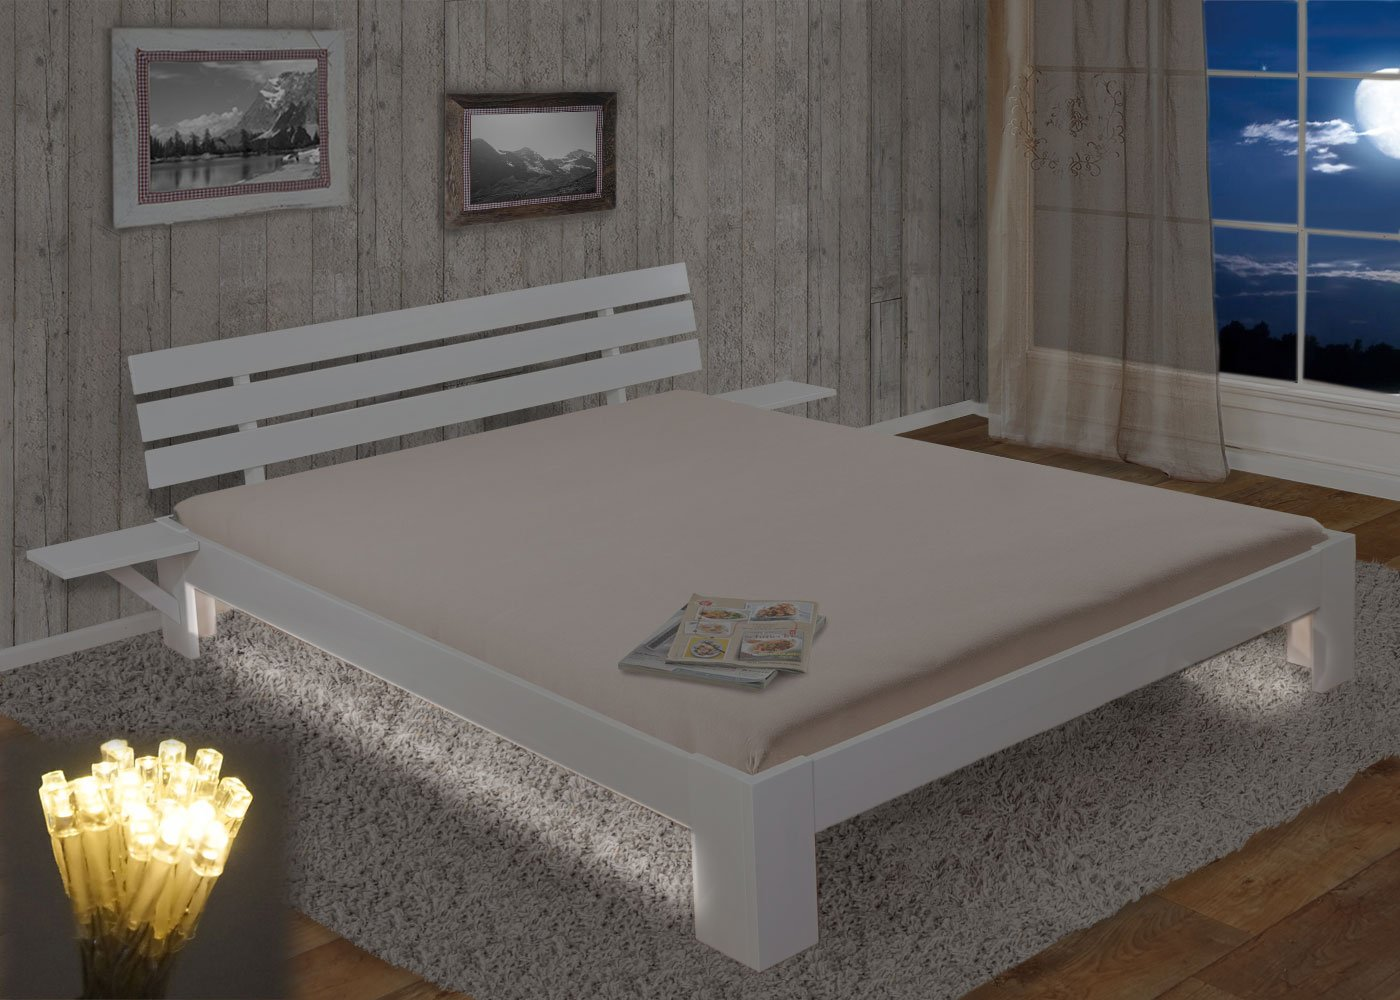 Bett Perth, Doppelbett, Massivholz incl. Lattenrost Ablage Kiefer ~ 180x200cm, weiß lackiert, LED